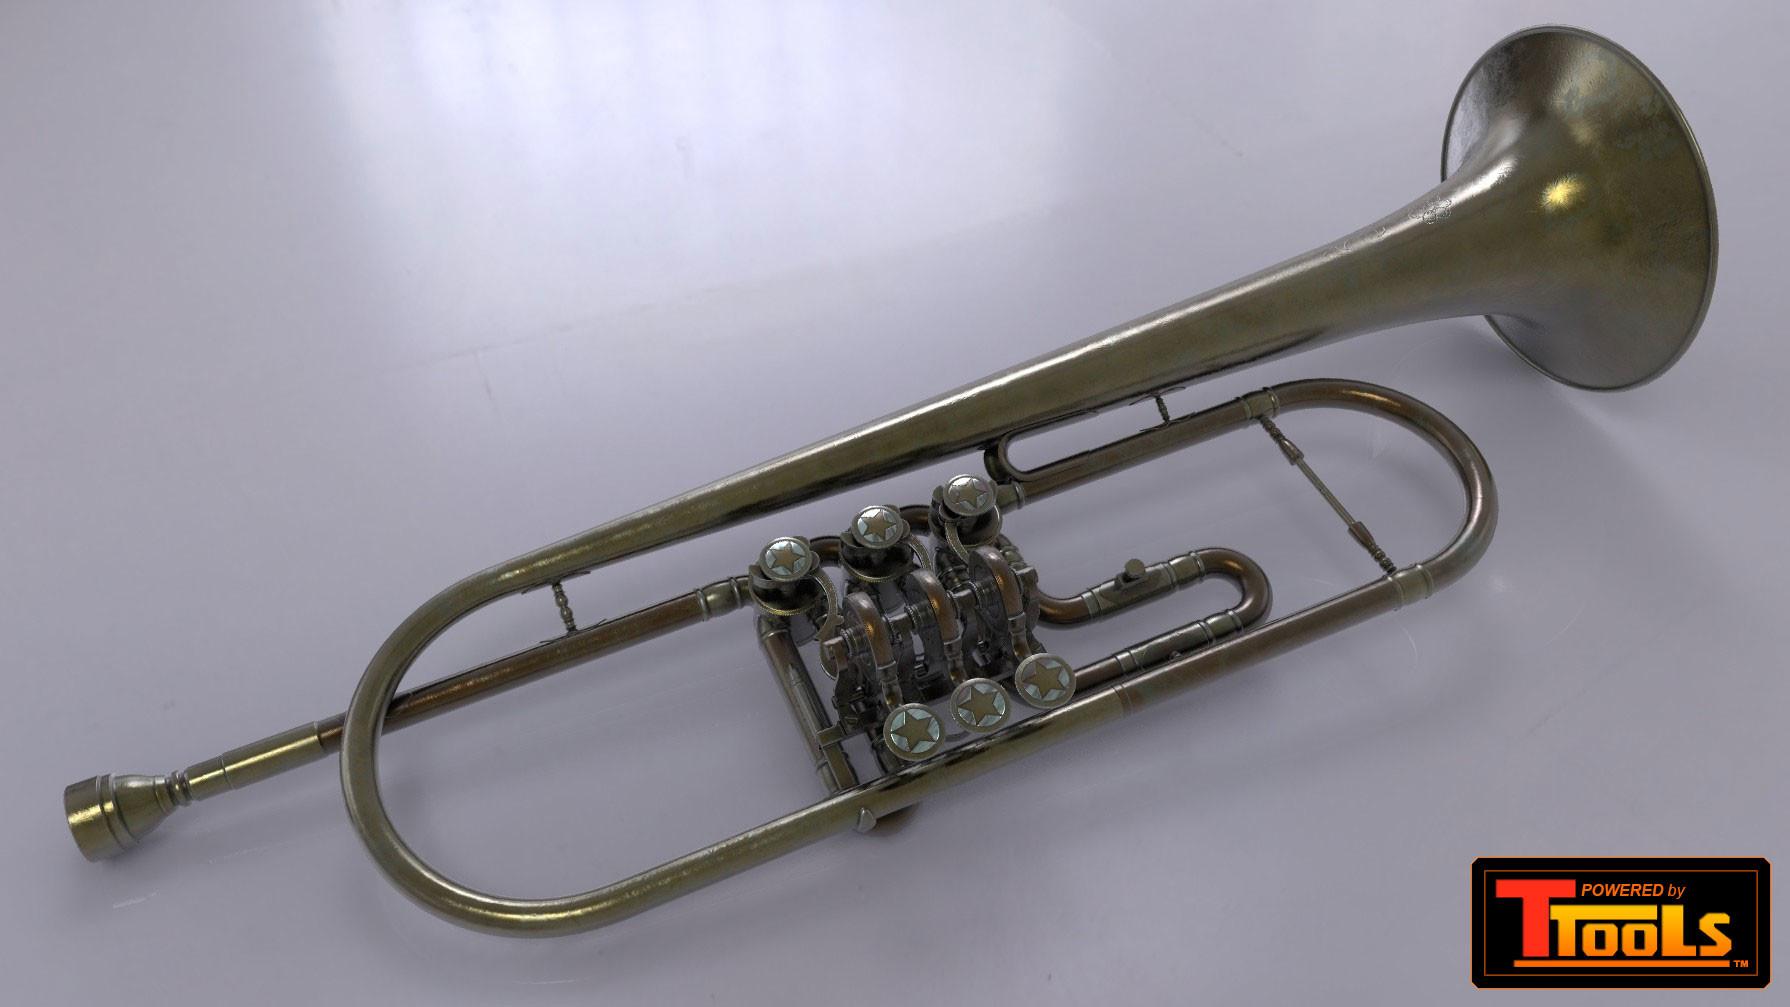 Ttools trumpet